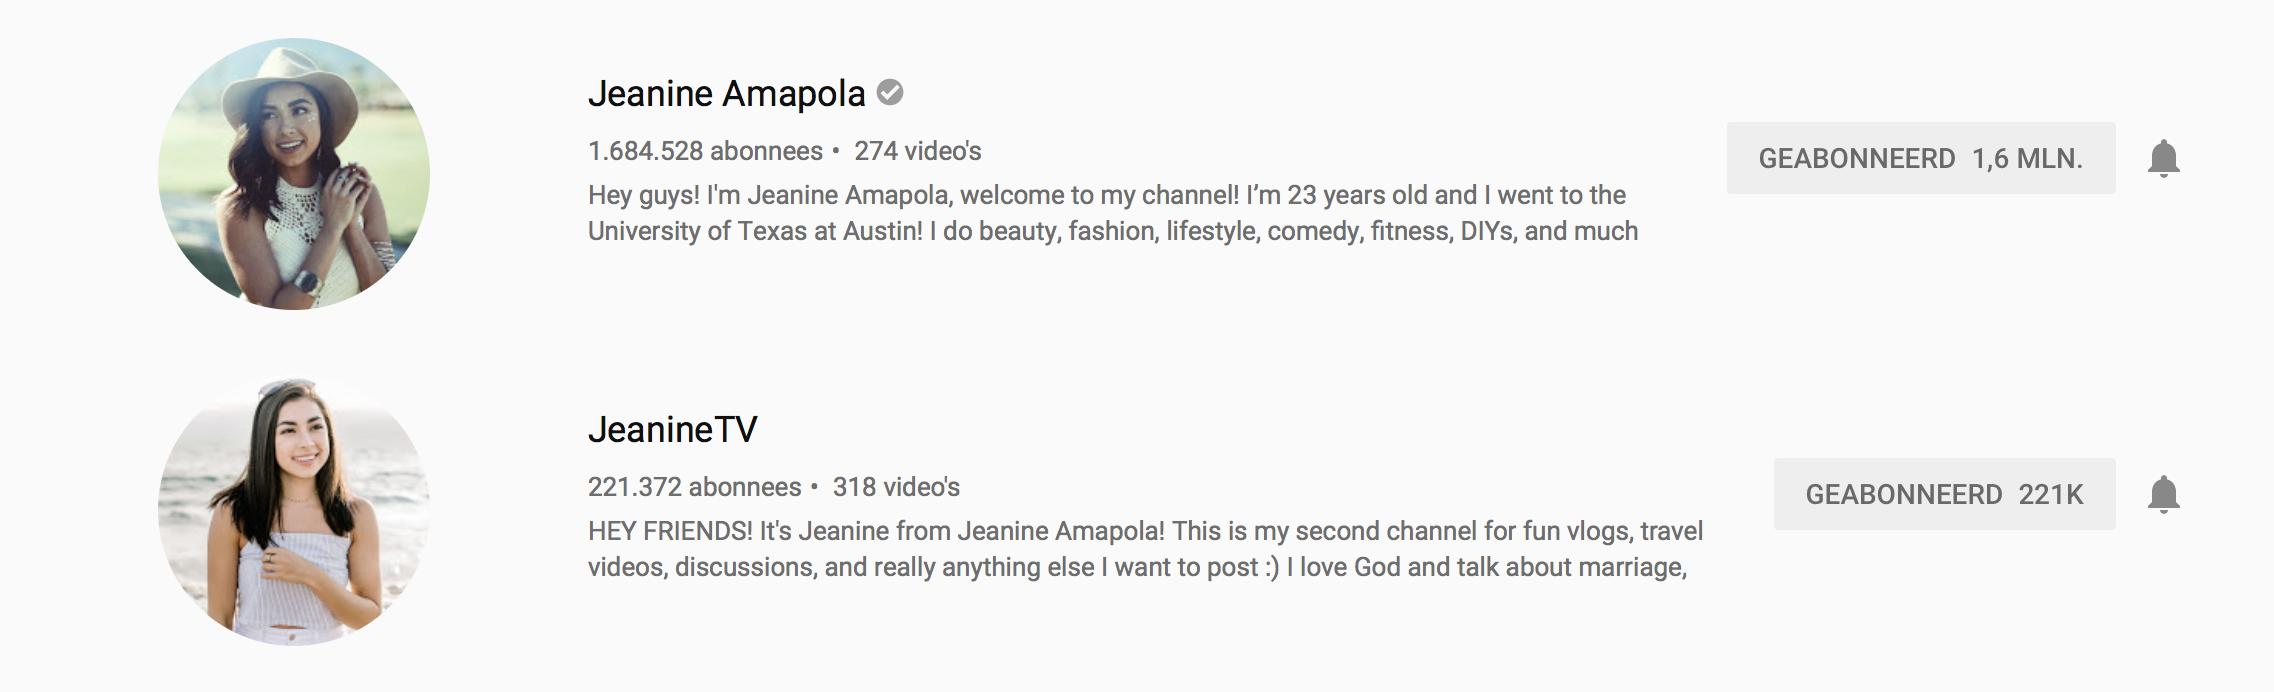 YouTubers I recently followed: JeanineTV